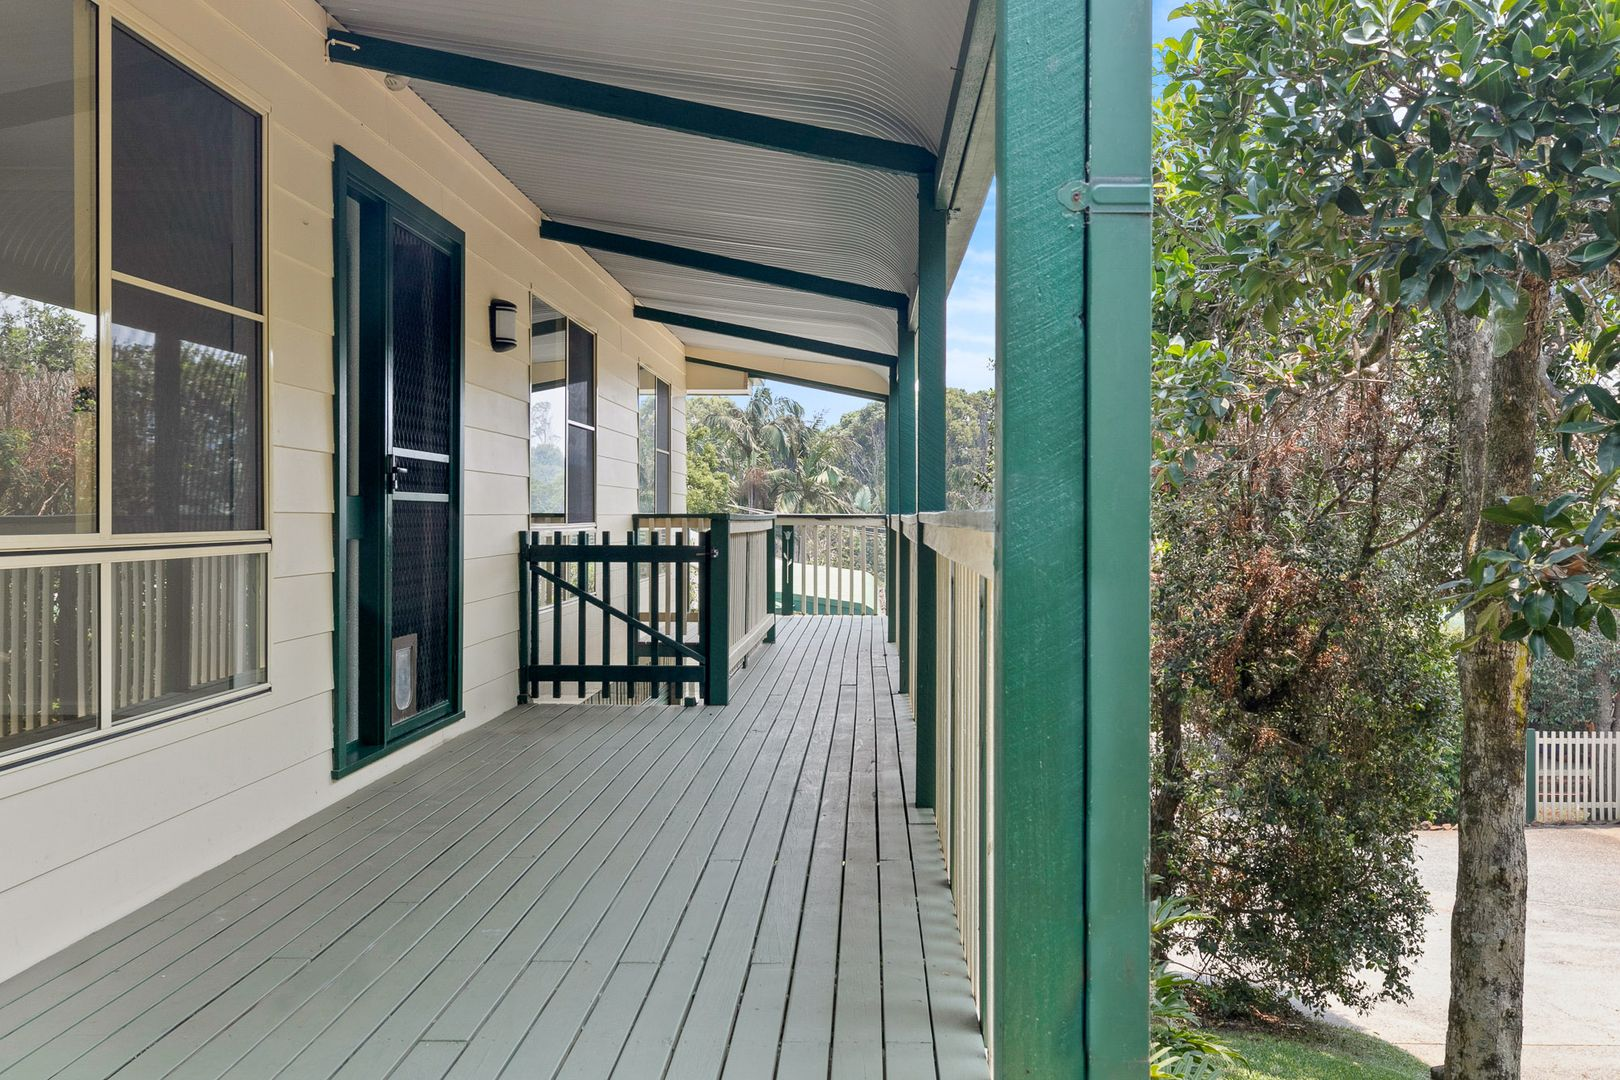 2/9 Colin Street, Bangalow NSW 2479, Image 2